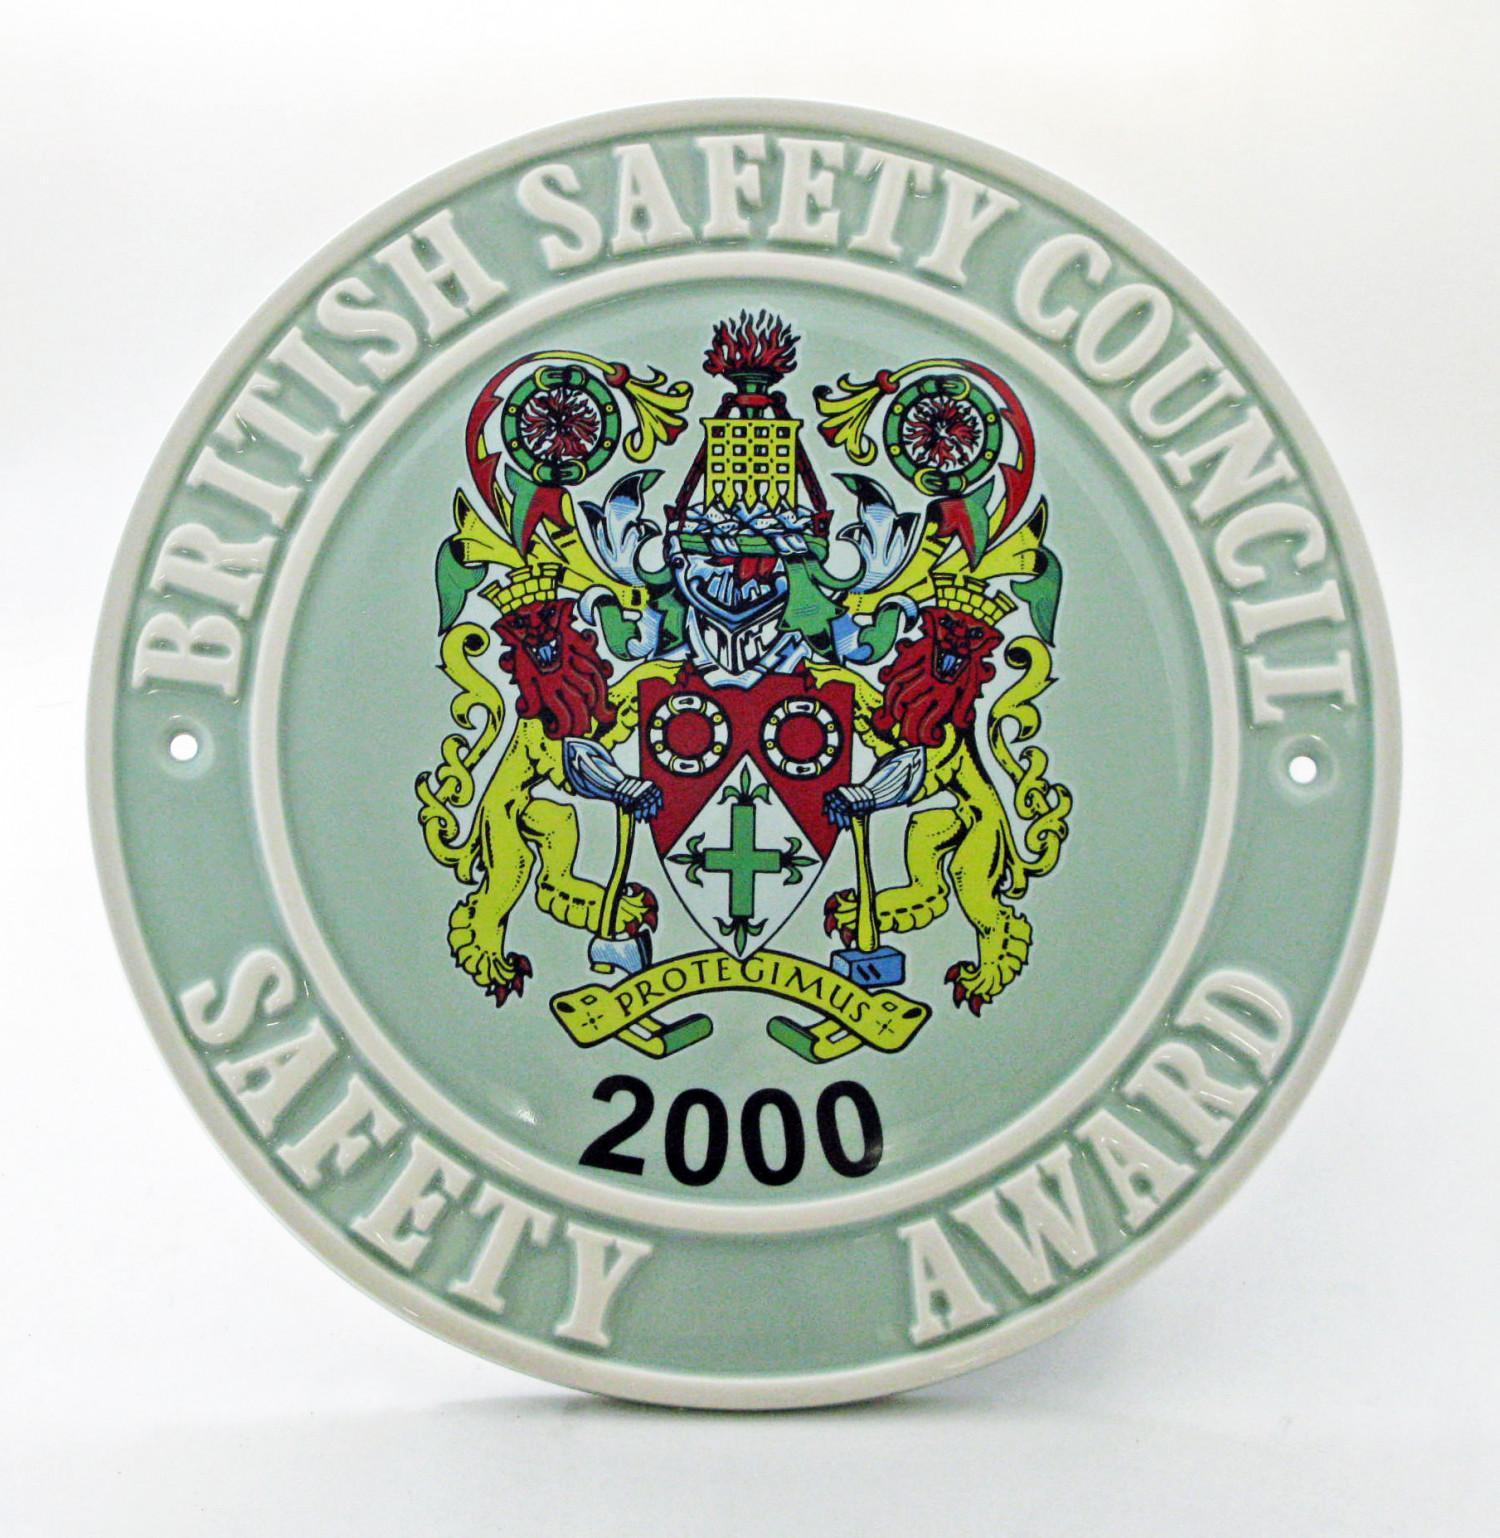 2000 Safety Award Plaque